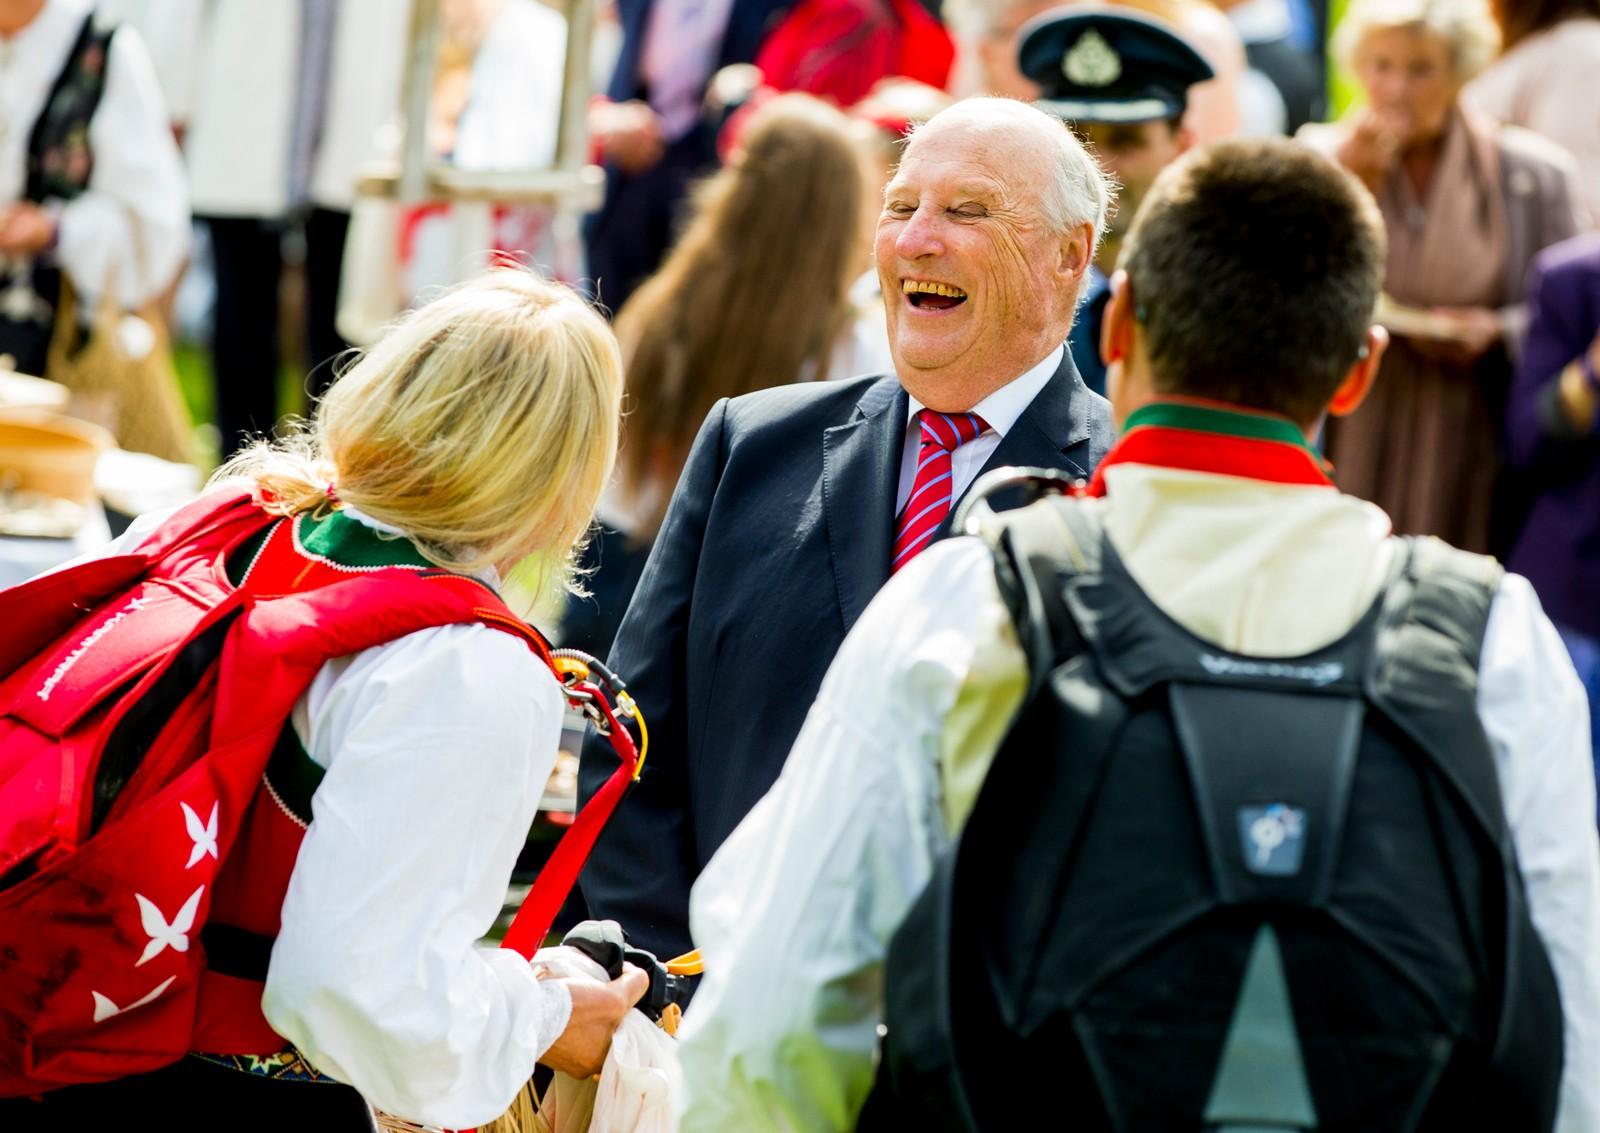 Det norske kongeparets 25-årsjubileum i 2016. Kong Harald hilser på Kari Traa som hoppet i fallskjerm under hagefesten på Gamlehaugen i Bergen lørdag ettemiddag.